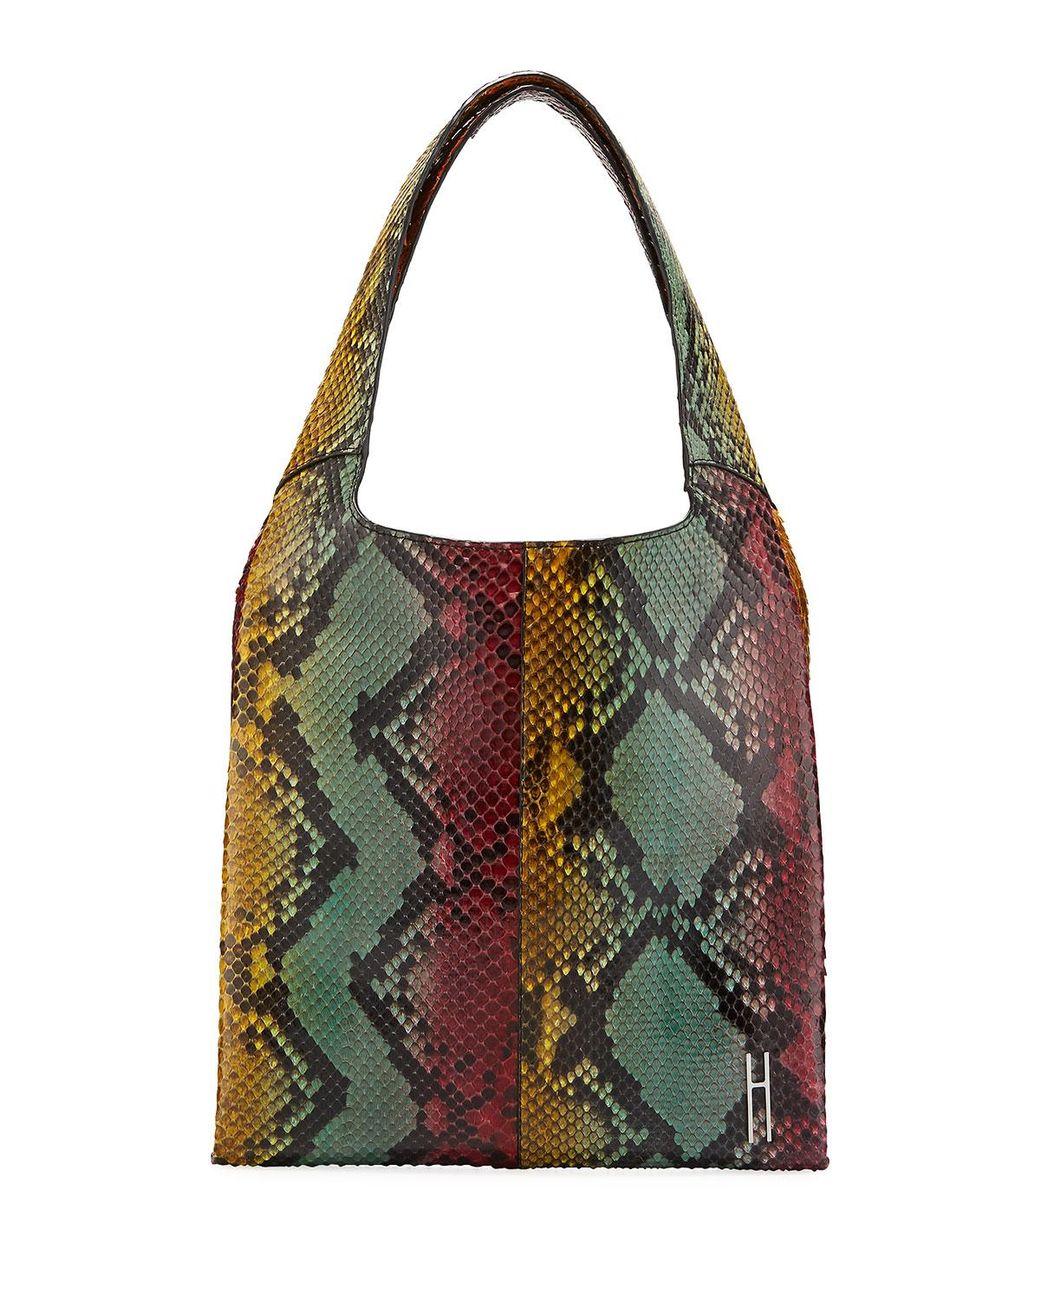 92ddcc4e316a Hayward. Women's Grand Shopper Python Tote Bag. $2,450 From Bergdorf Goodman